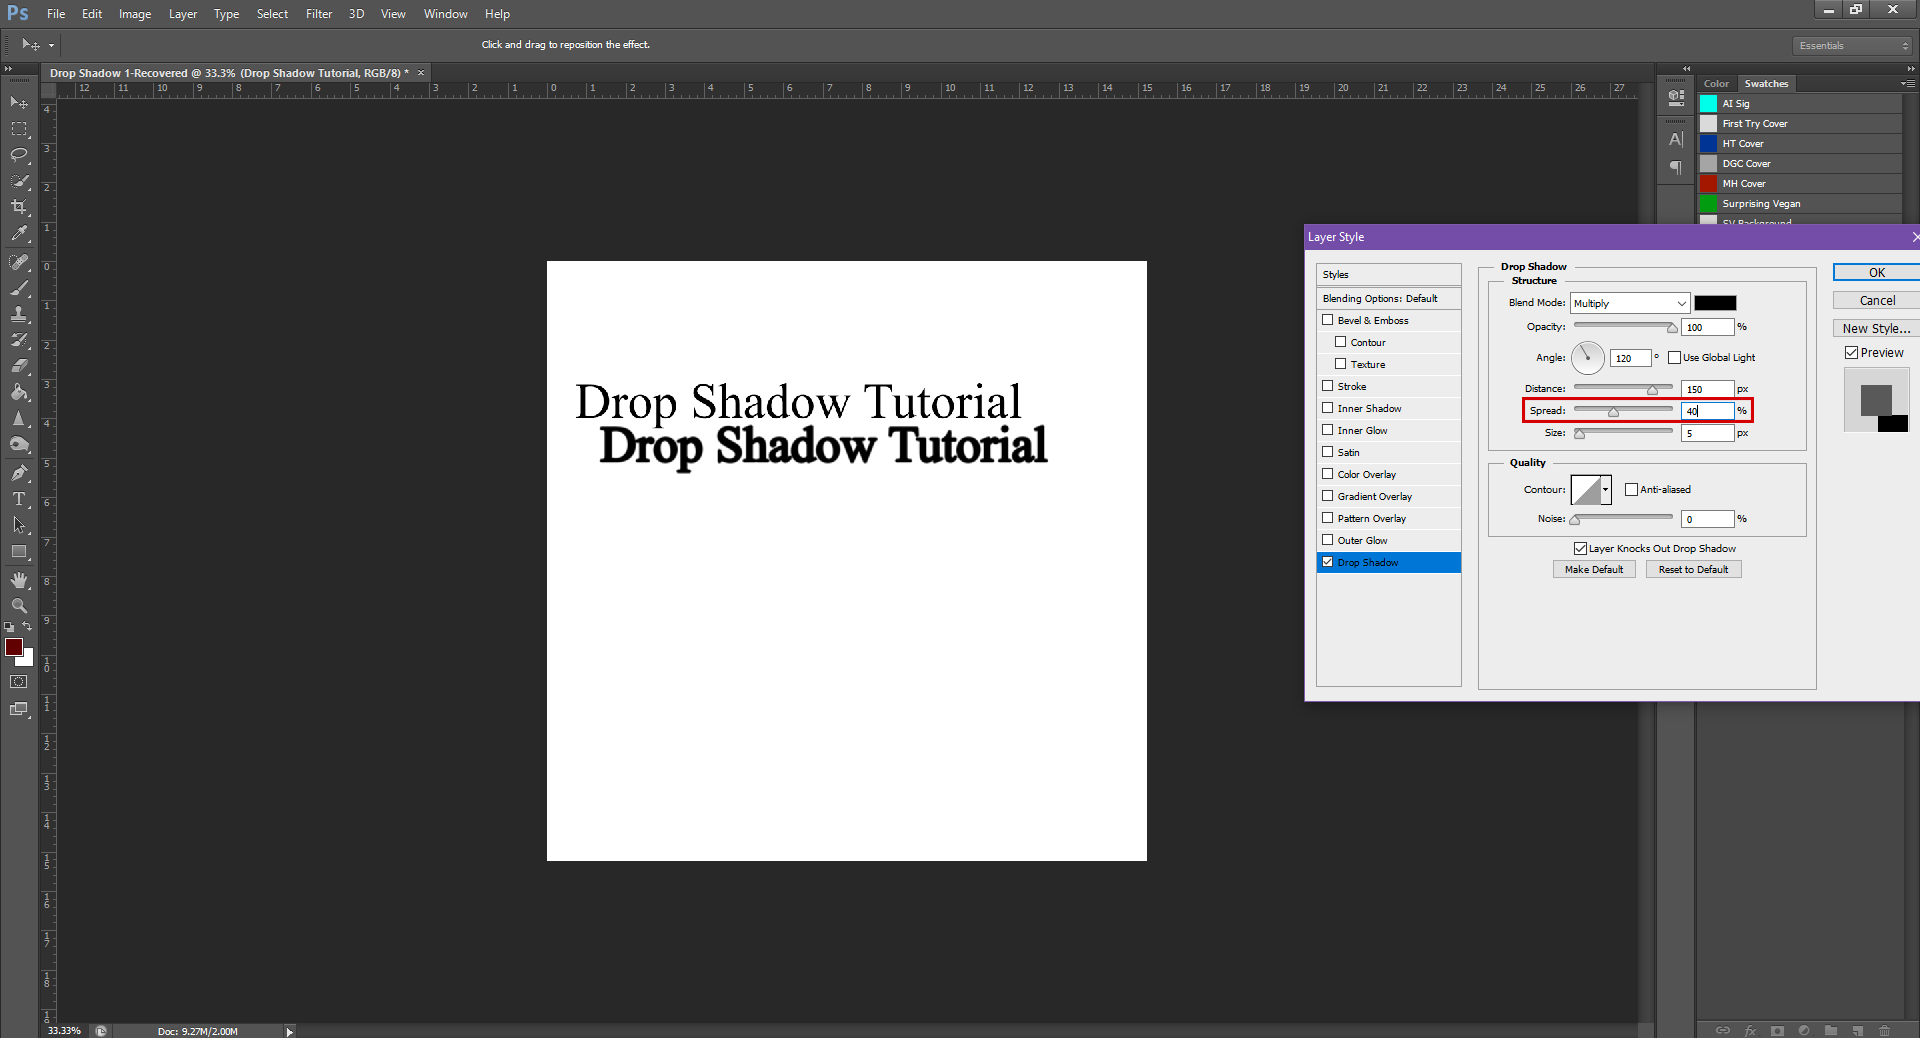 AterImber.com - Writing - Writing Tips - PHSH Tutorial - Drop Shadow - Spread